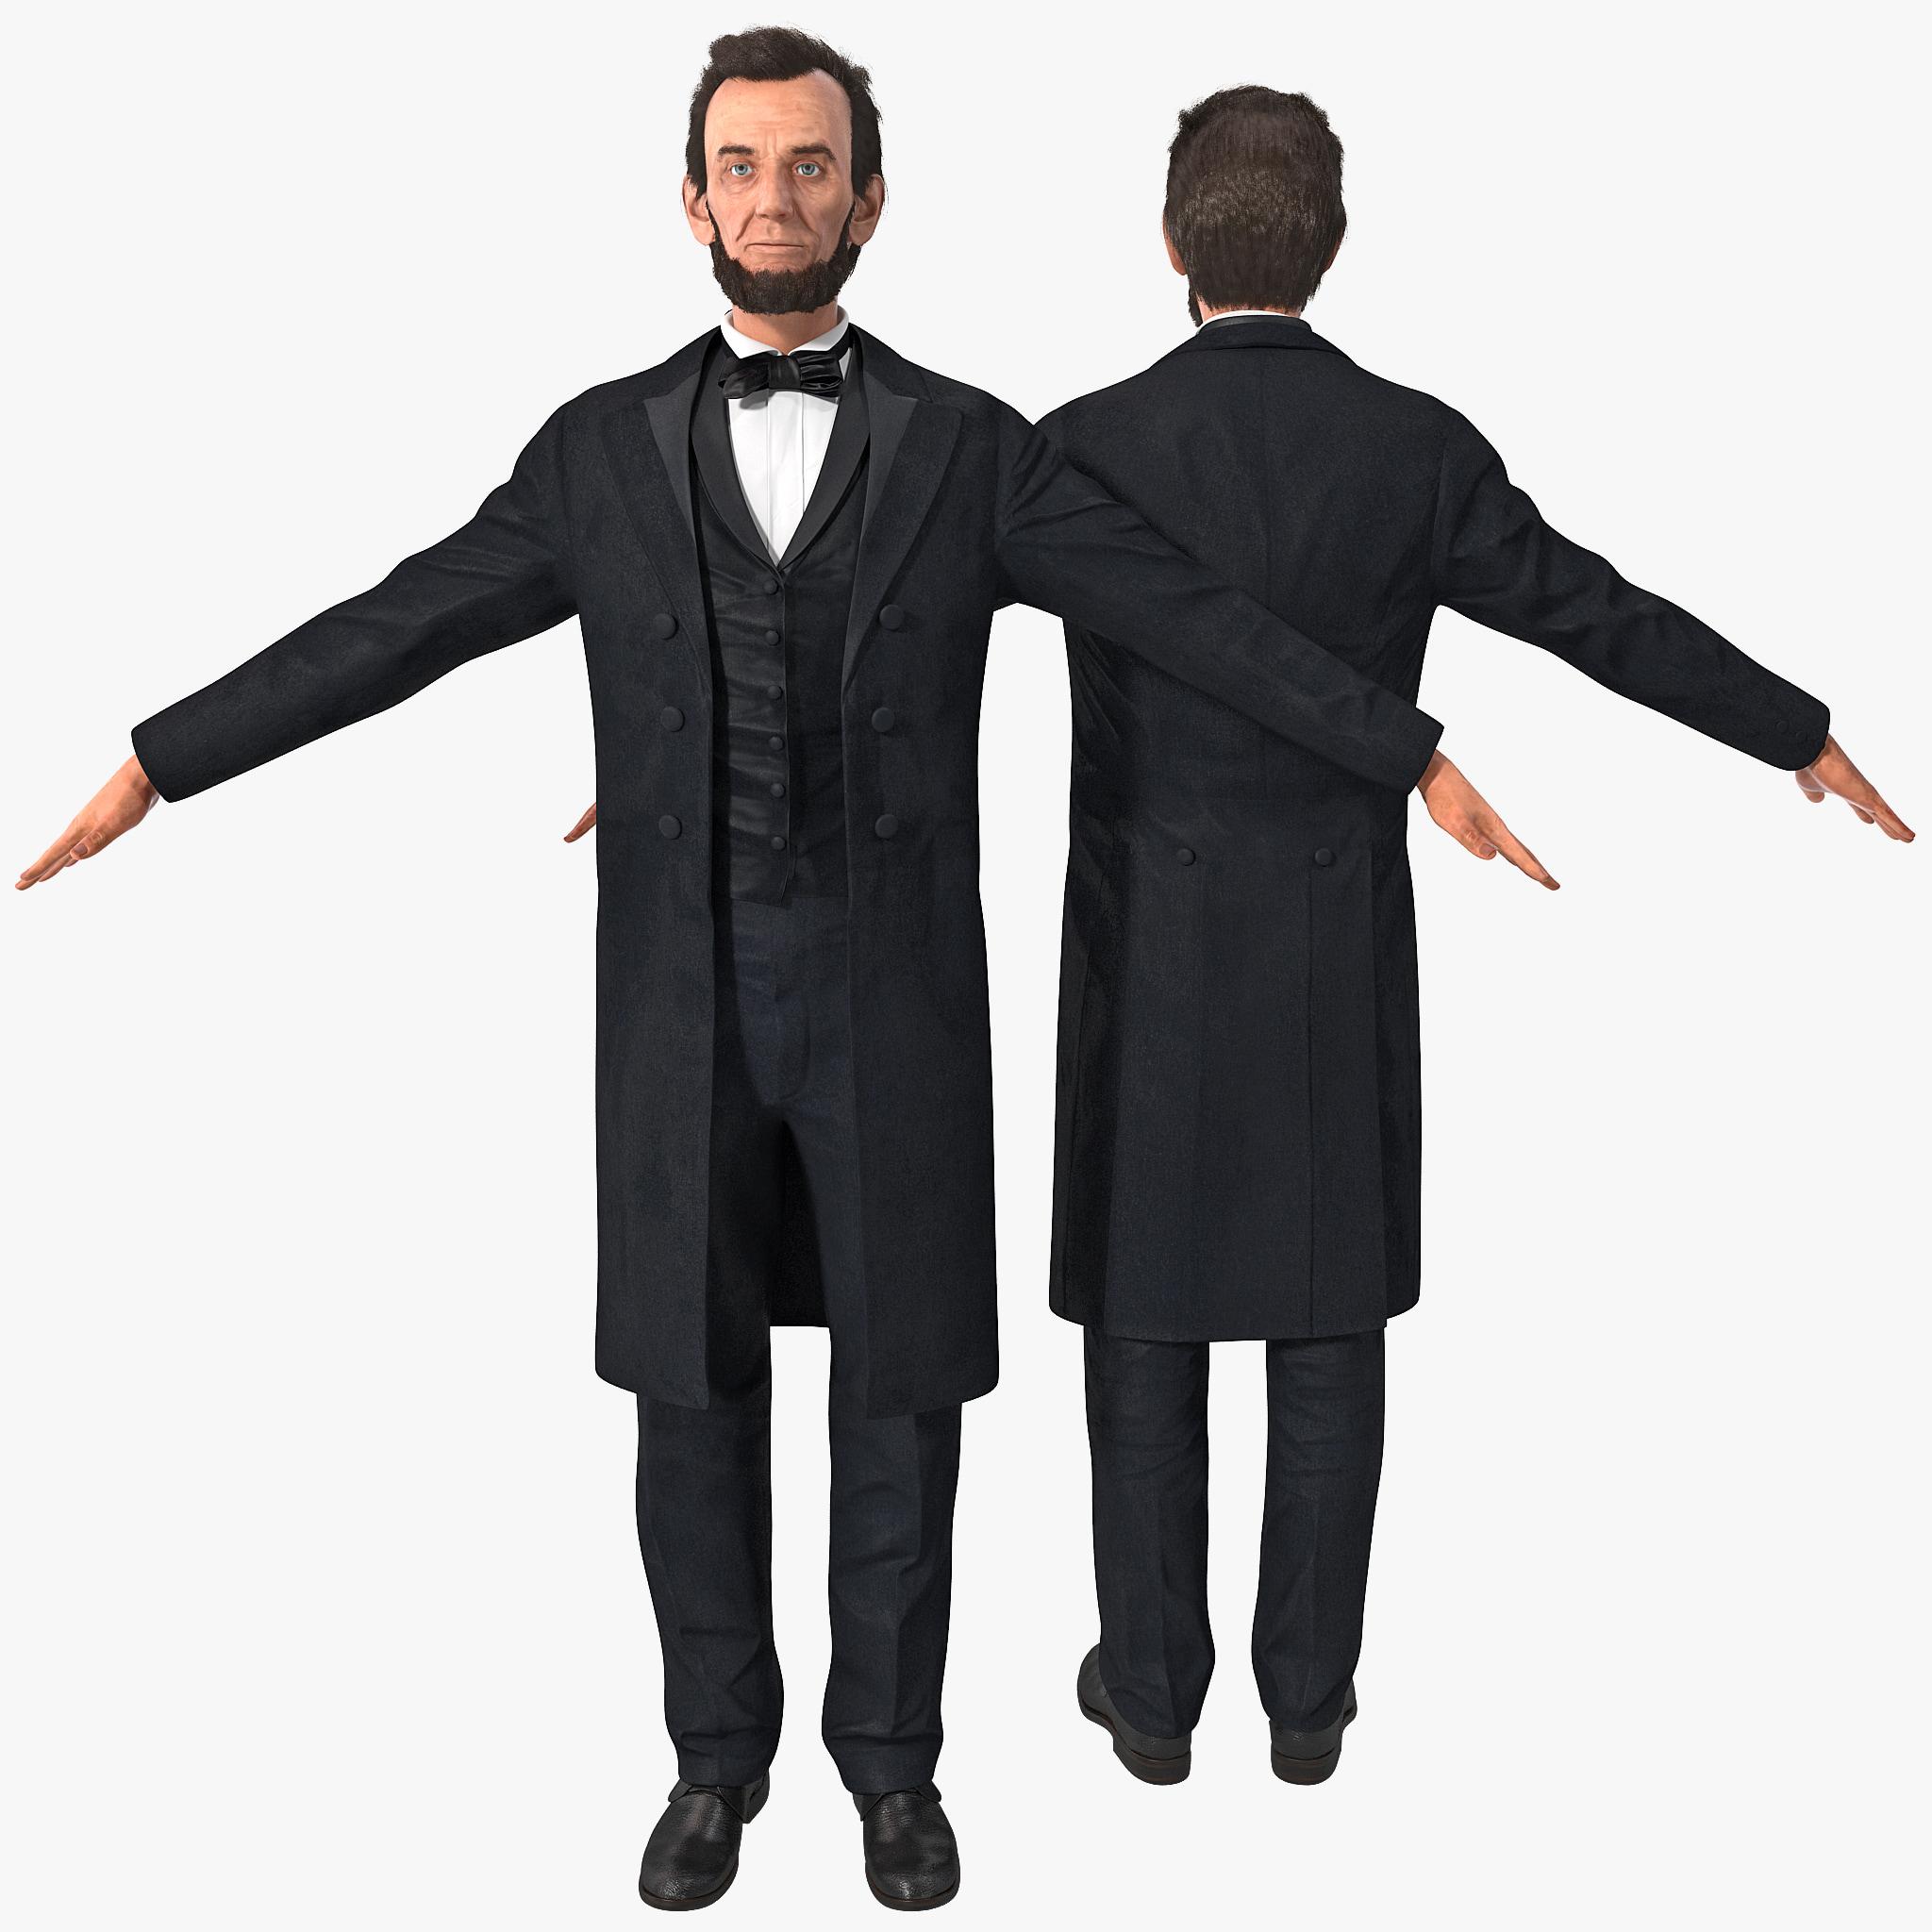 Abraham Lincoln_1.jpg